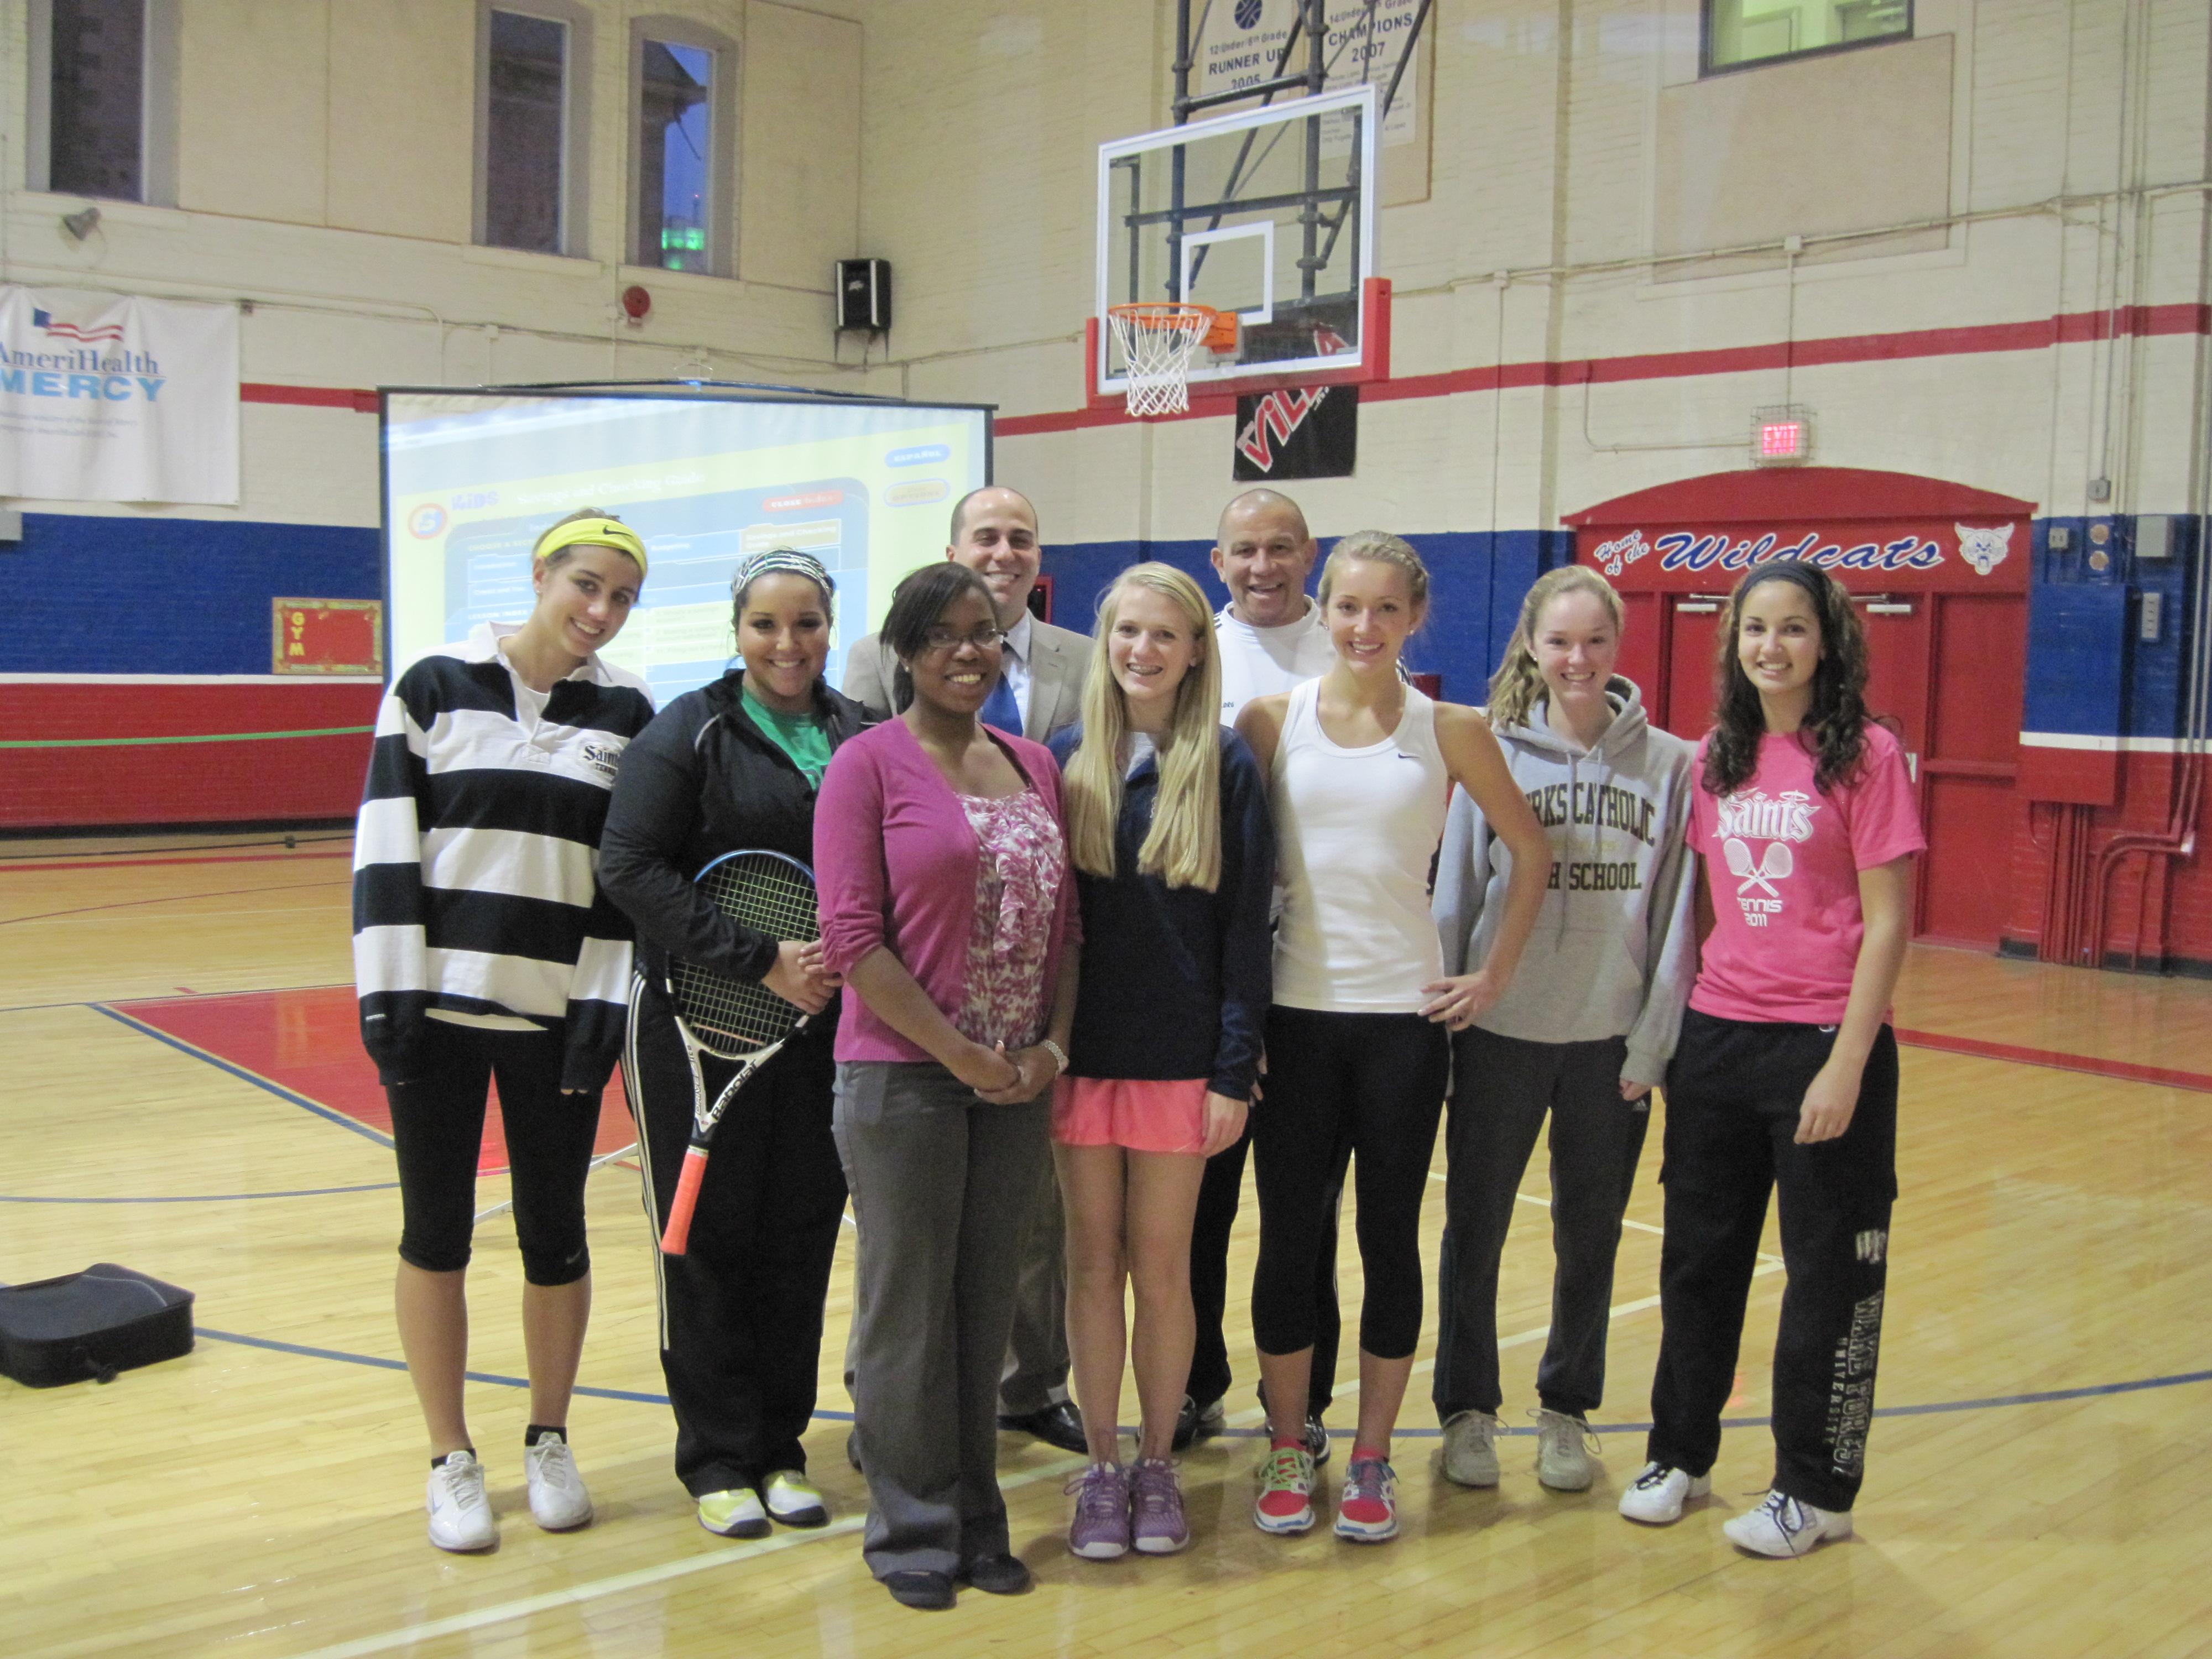 Set Point Tennis Mentors Olivet Boys & Girls Club